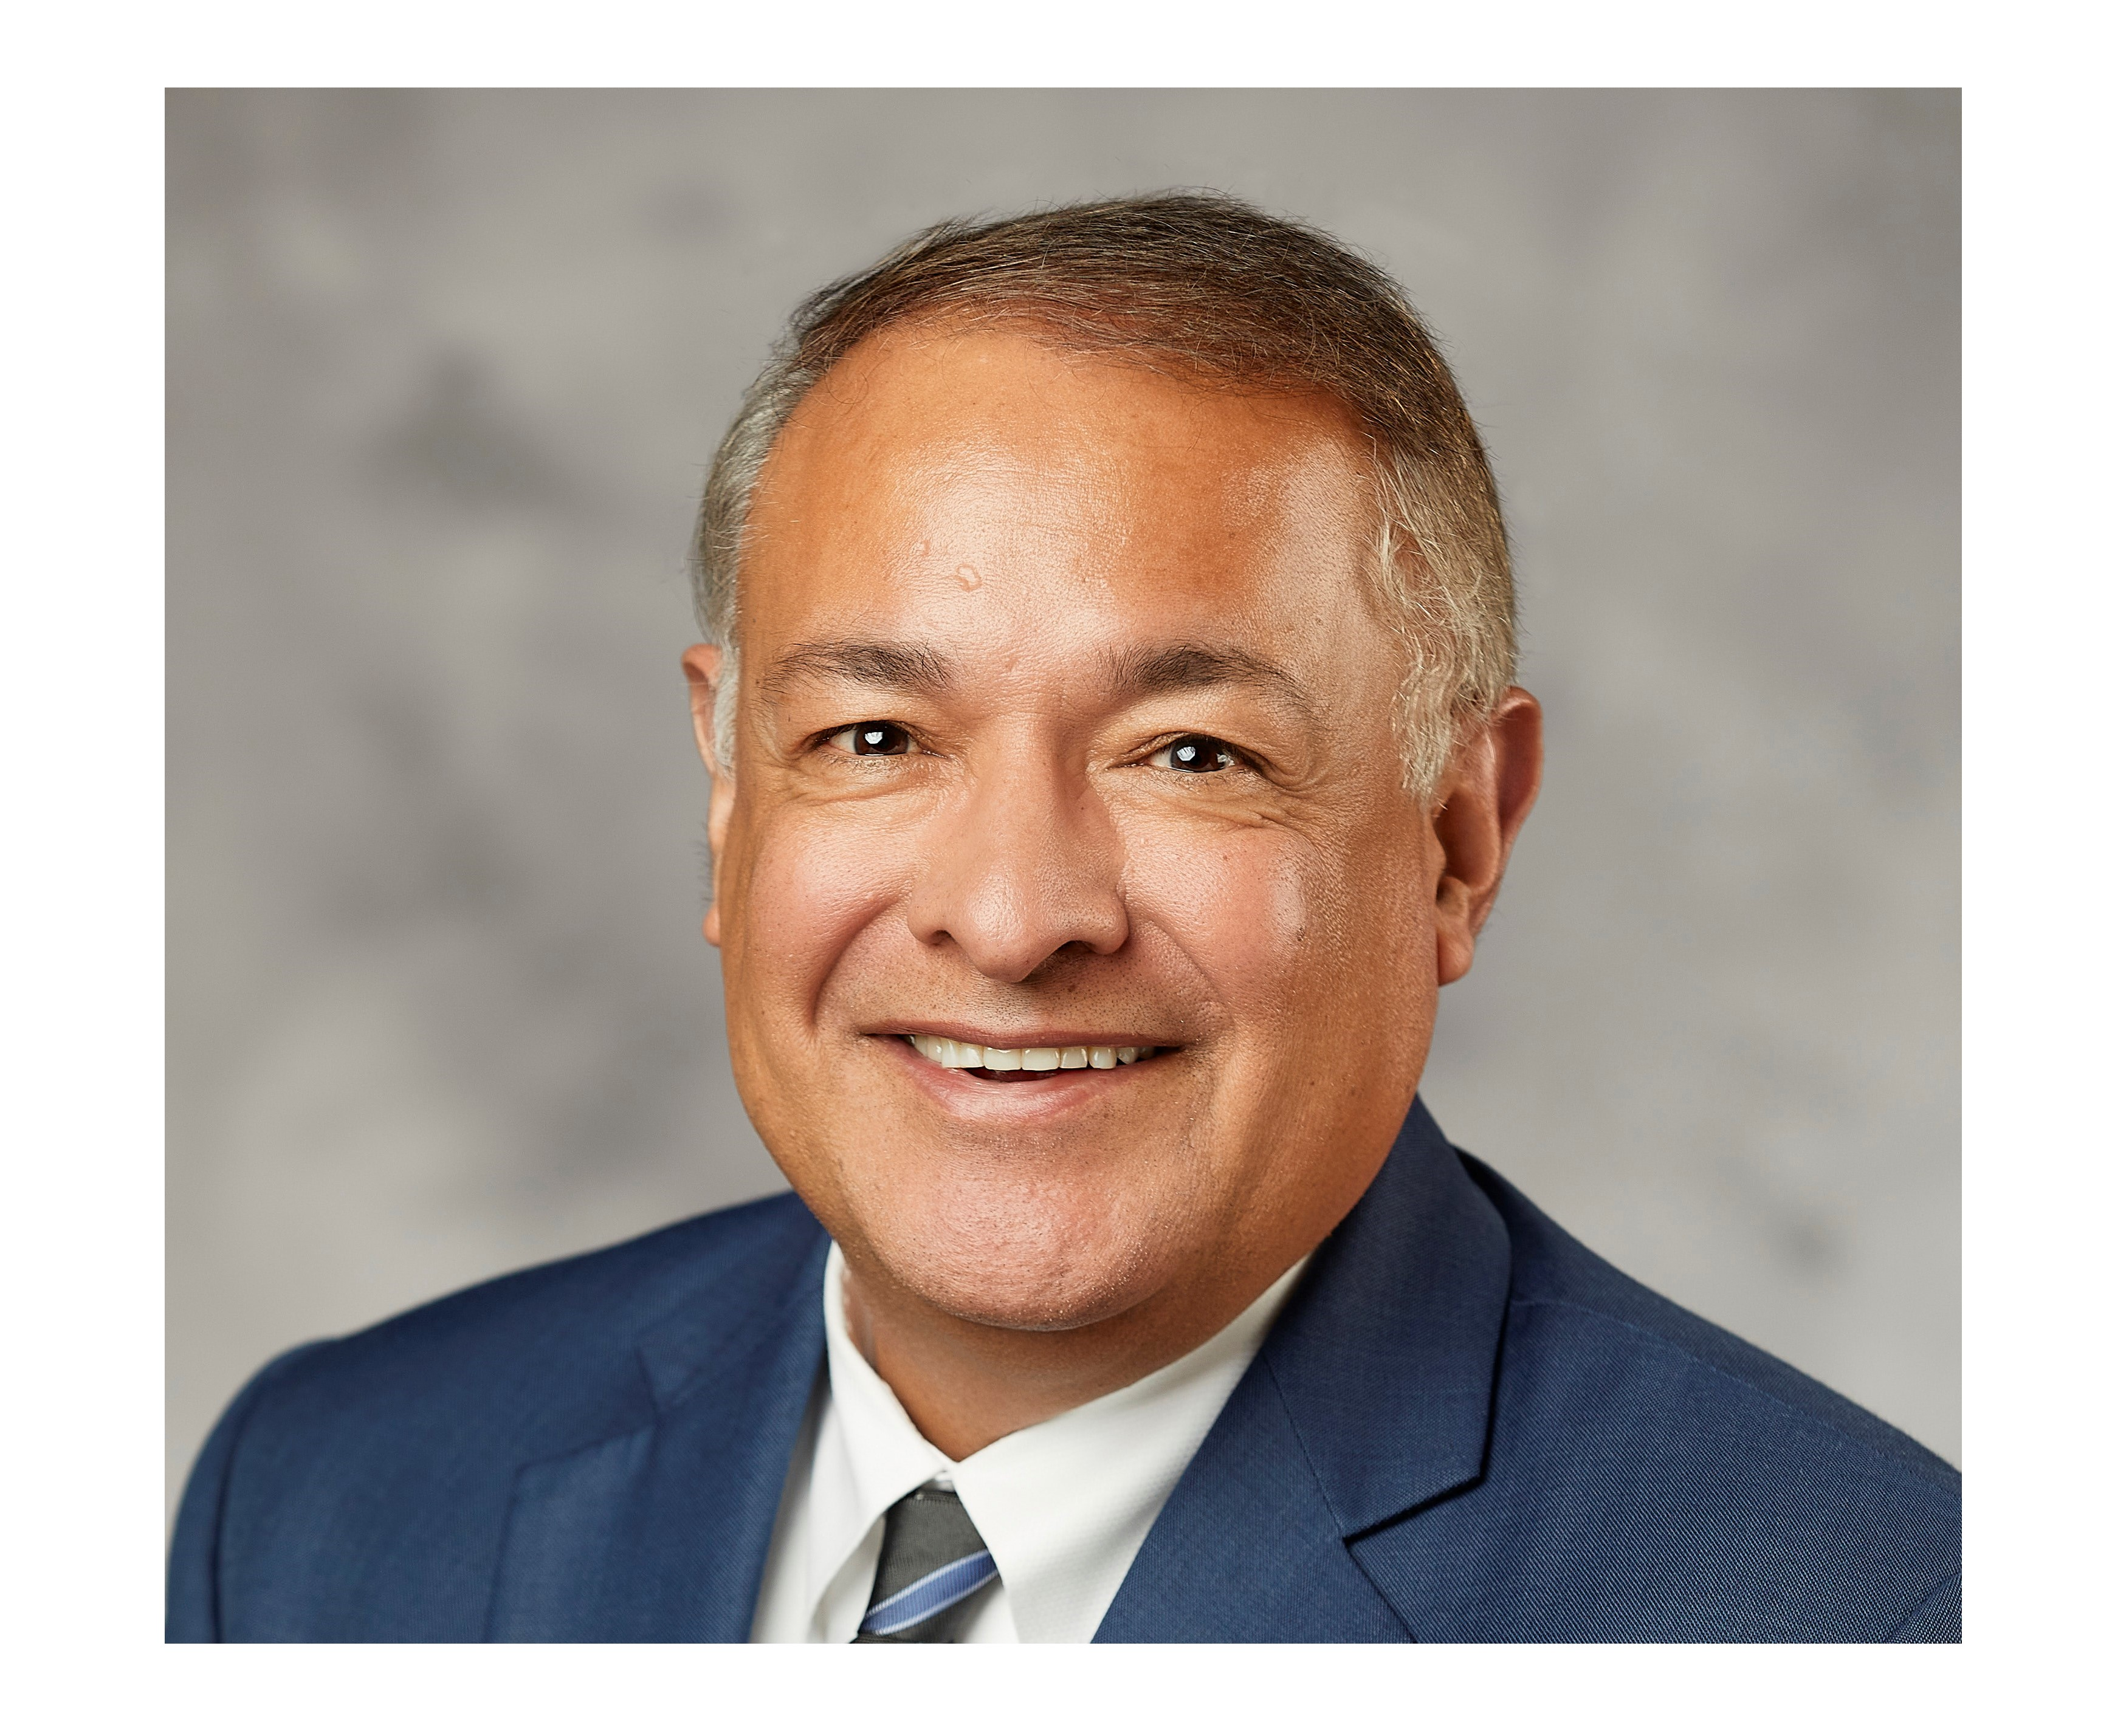 Spotlight on Campus Safety Director of the Year Finalist Adam Garcia